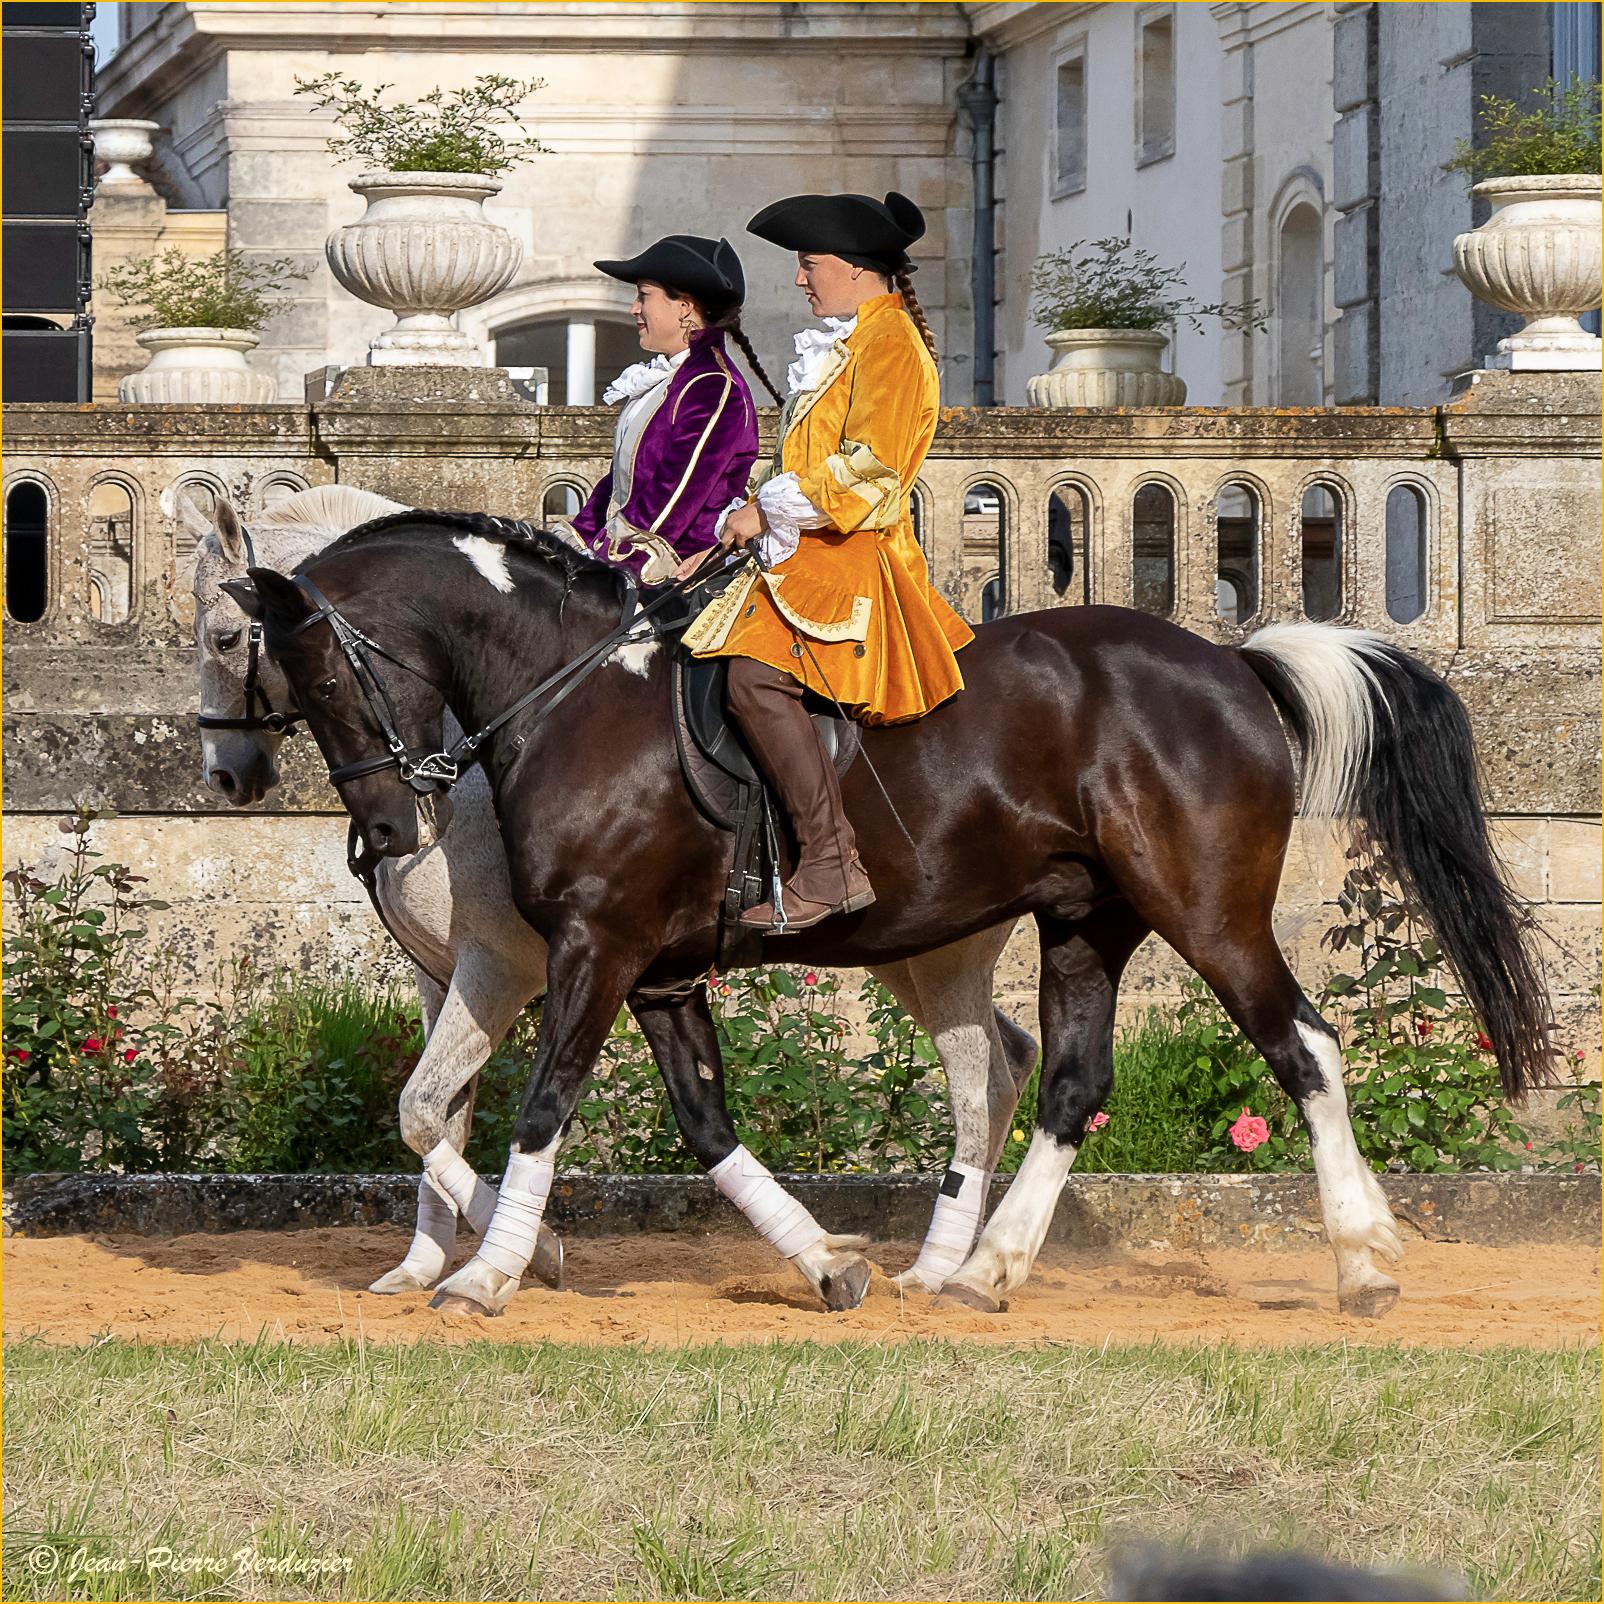 Symphonie Equestre-19 Mai 2018-7649